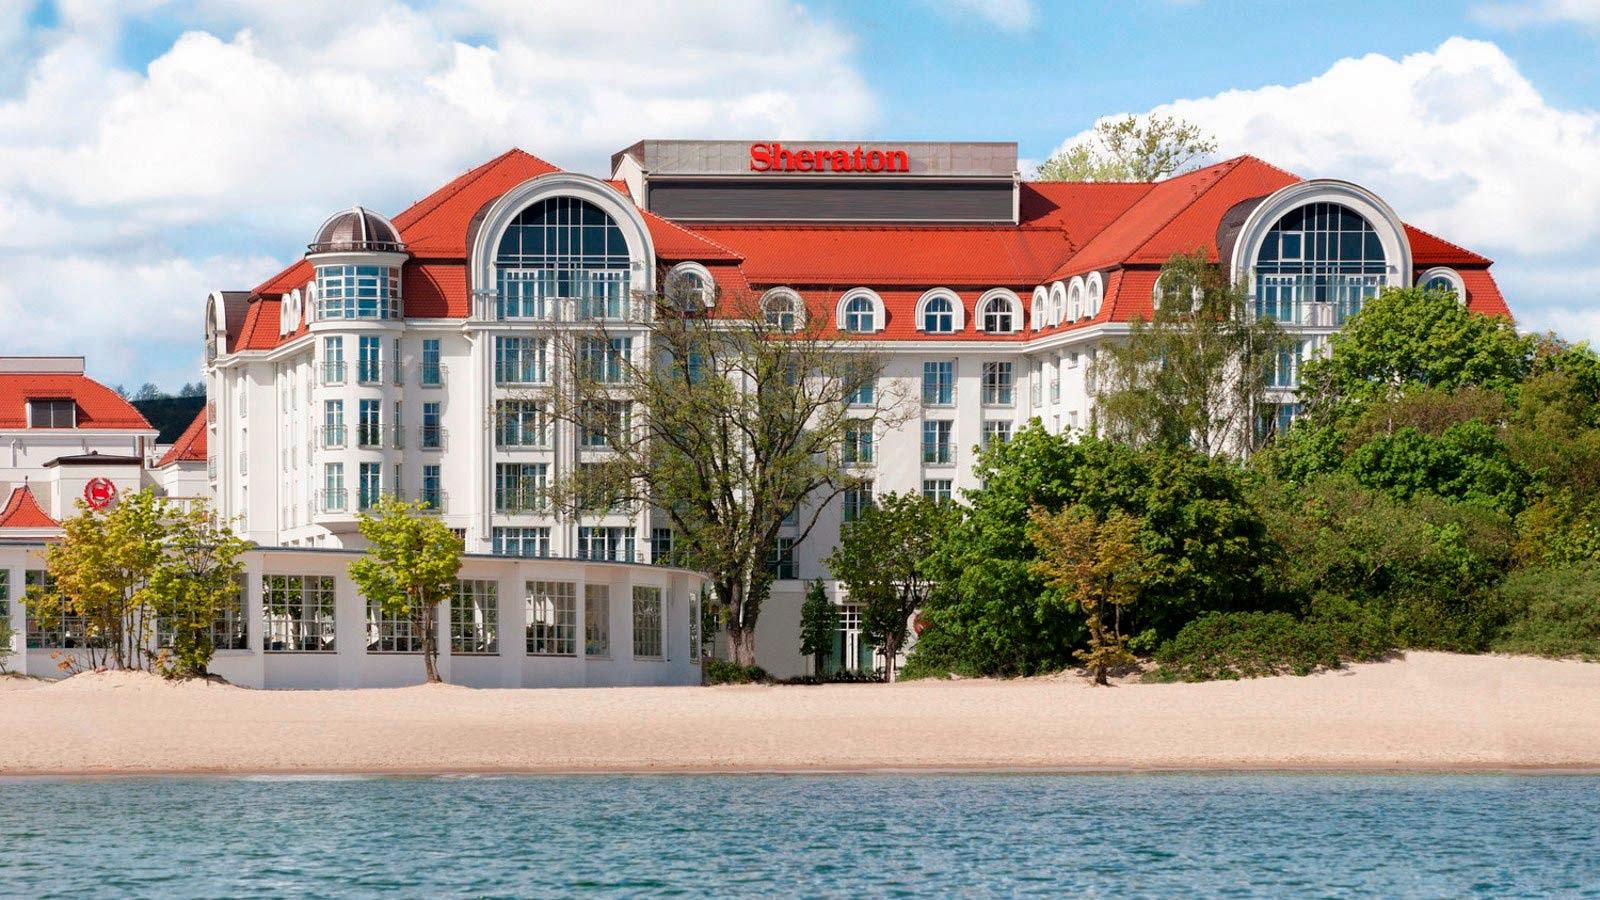 Hotel Sheraton w Sopocie